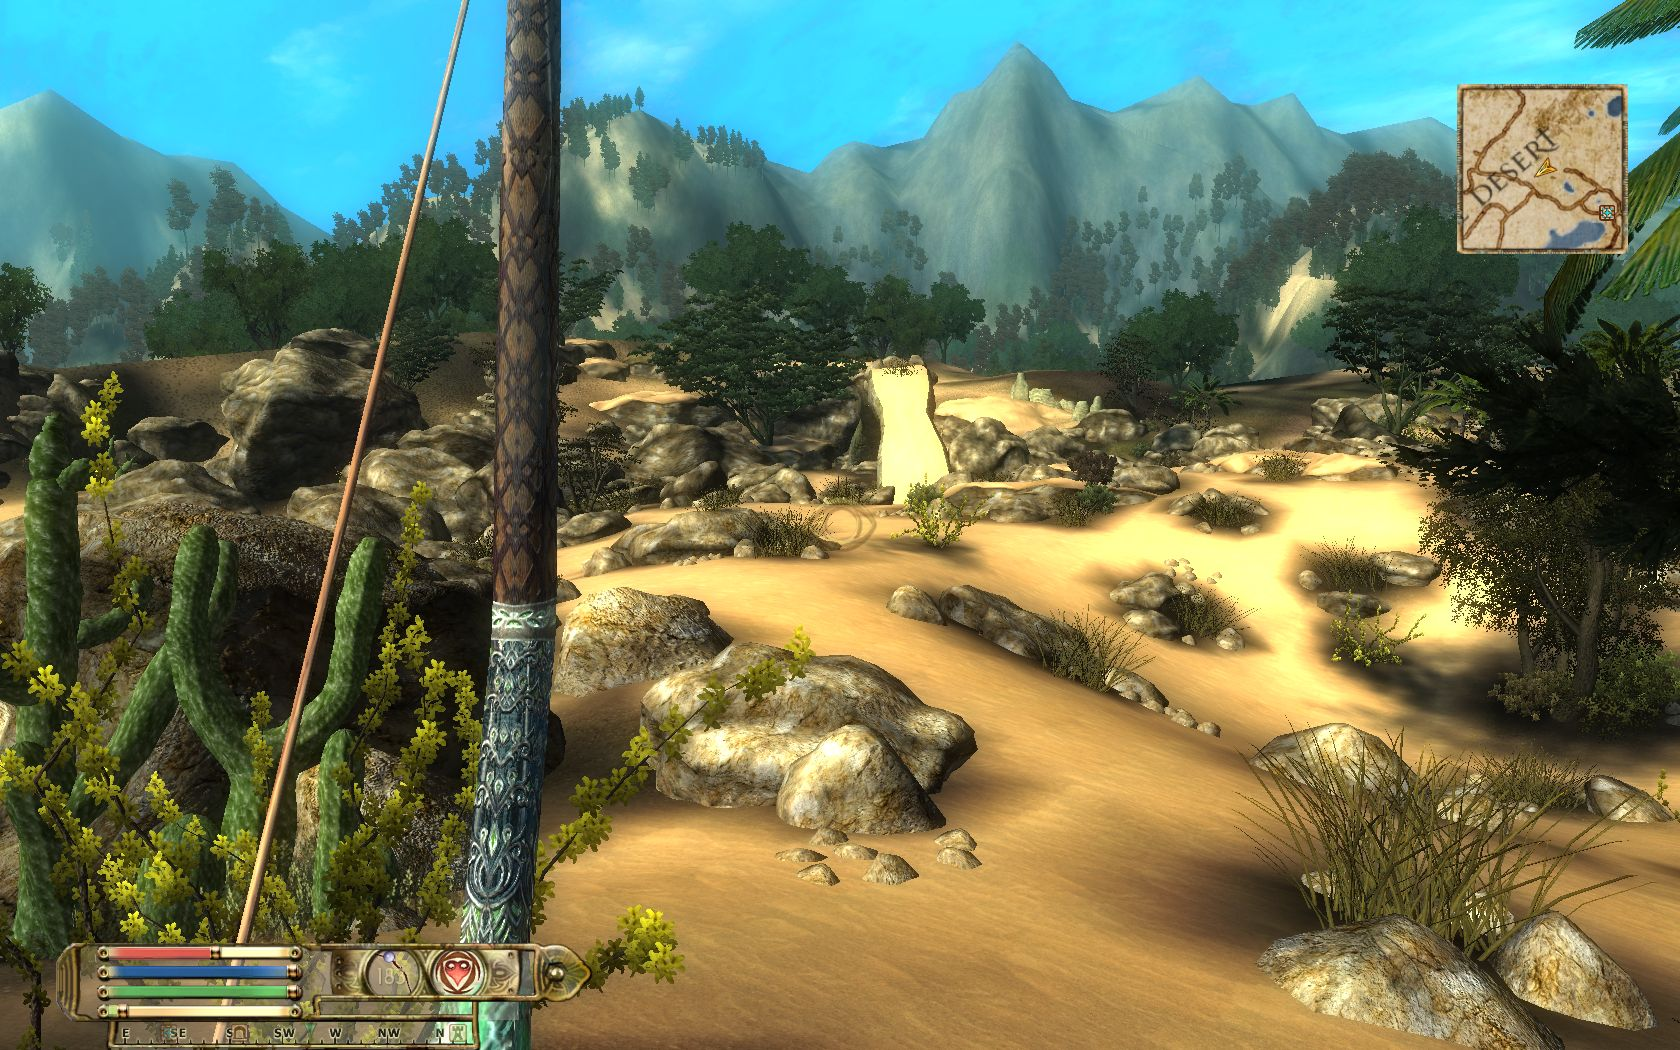 Morrowind mods sex nude download romance